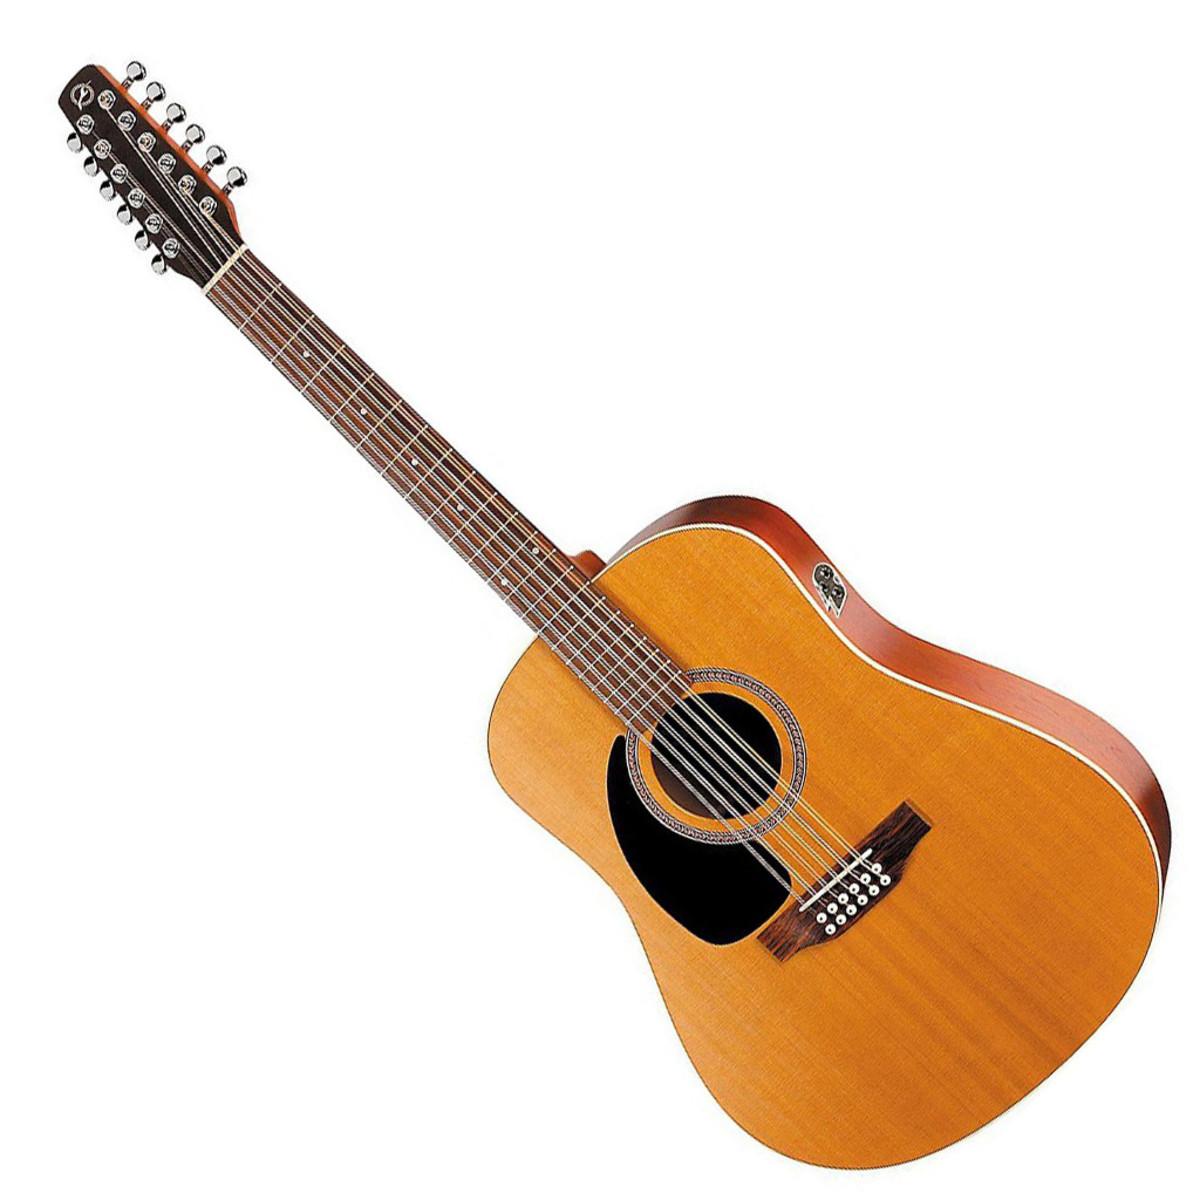 seagull coastline s12 cedar left qi 12 string electro acoustic guitar at. Black Bedroom Furniture Sets. Home Design Ideas